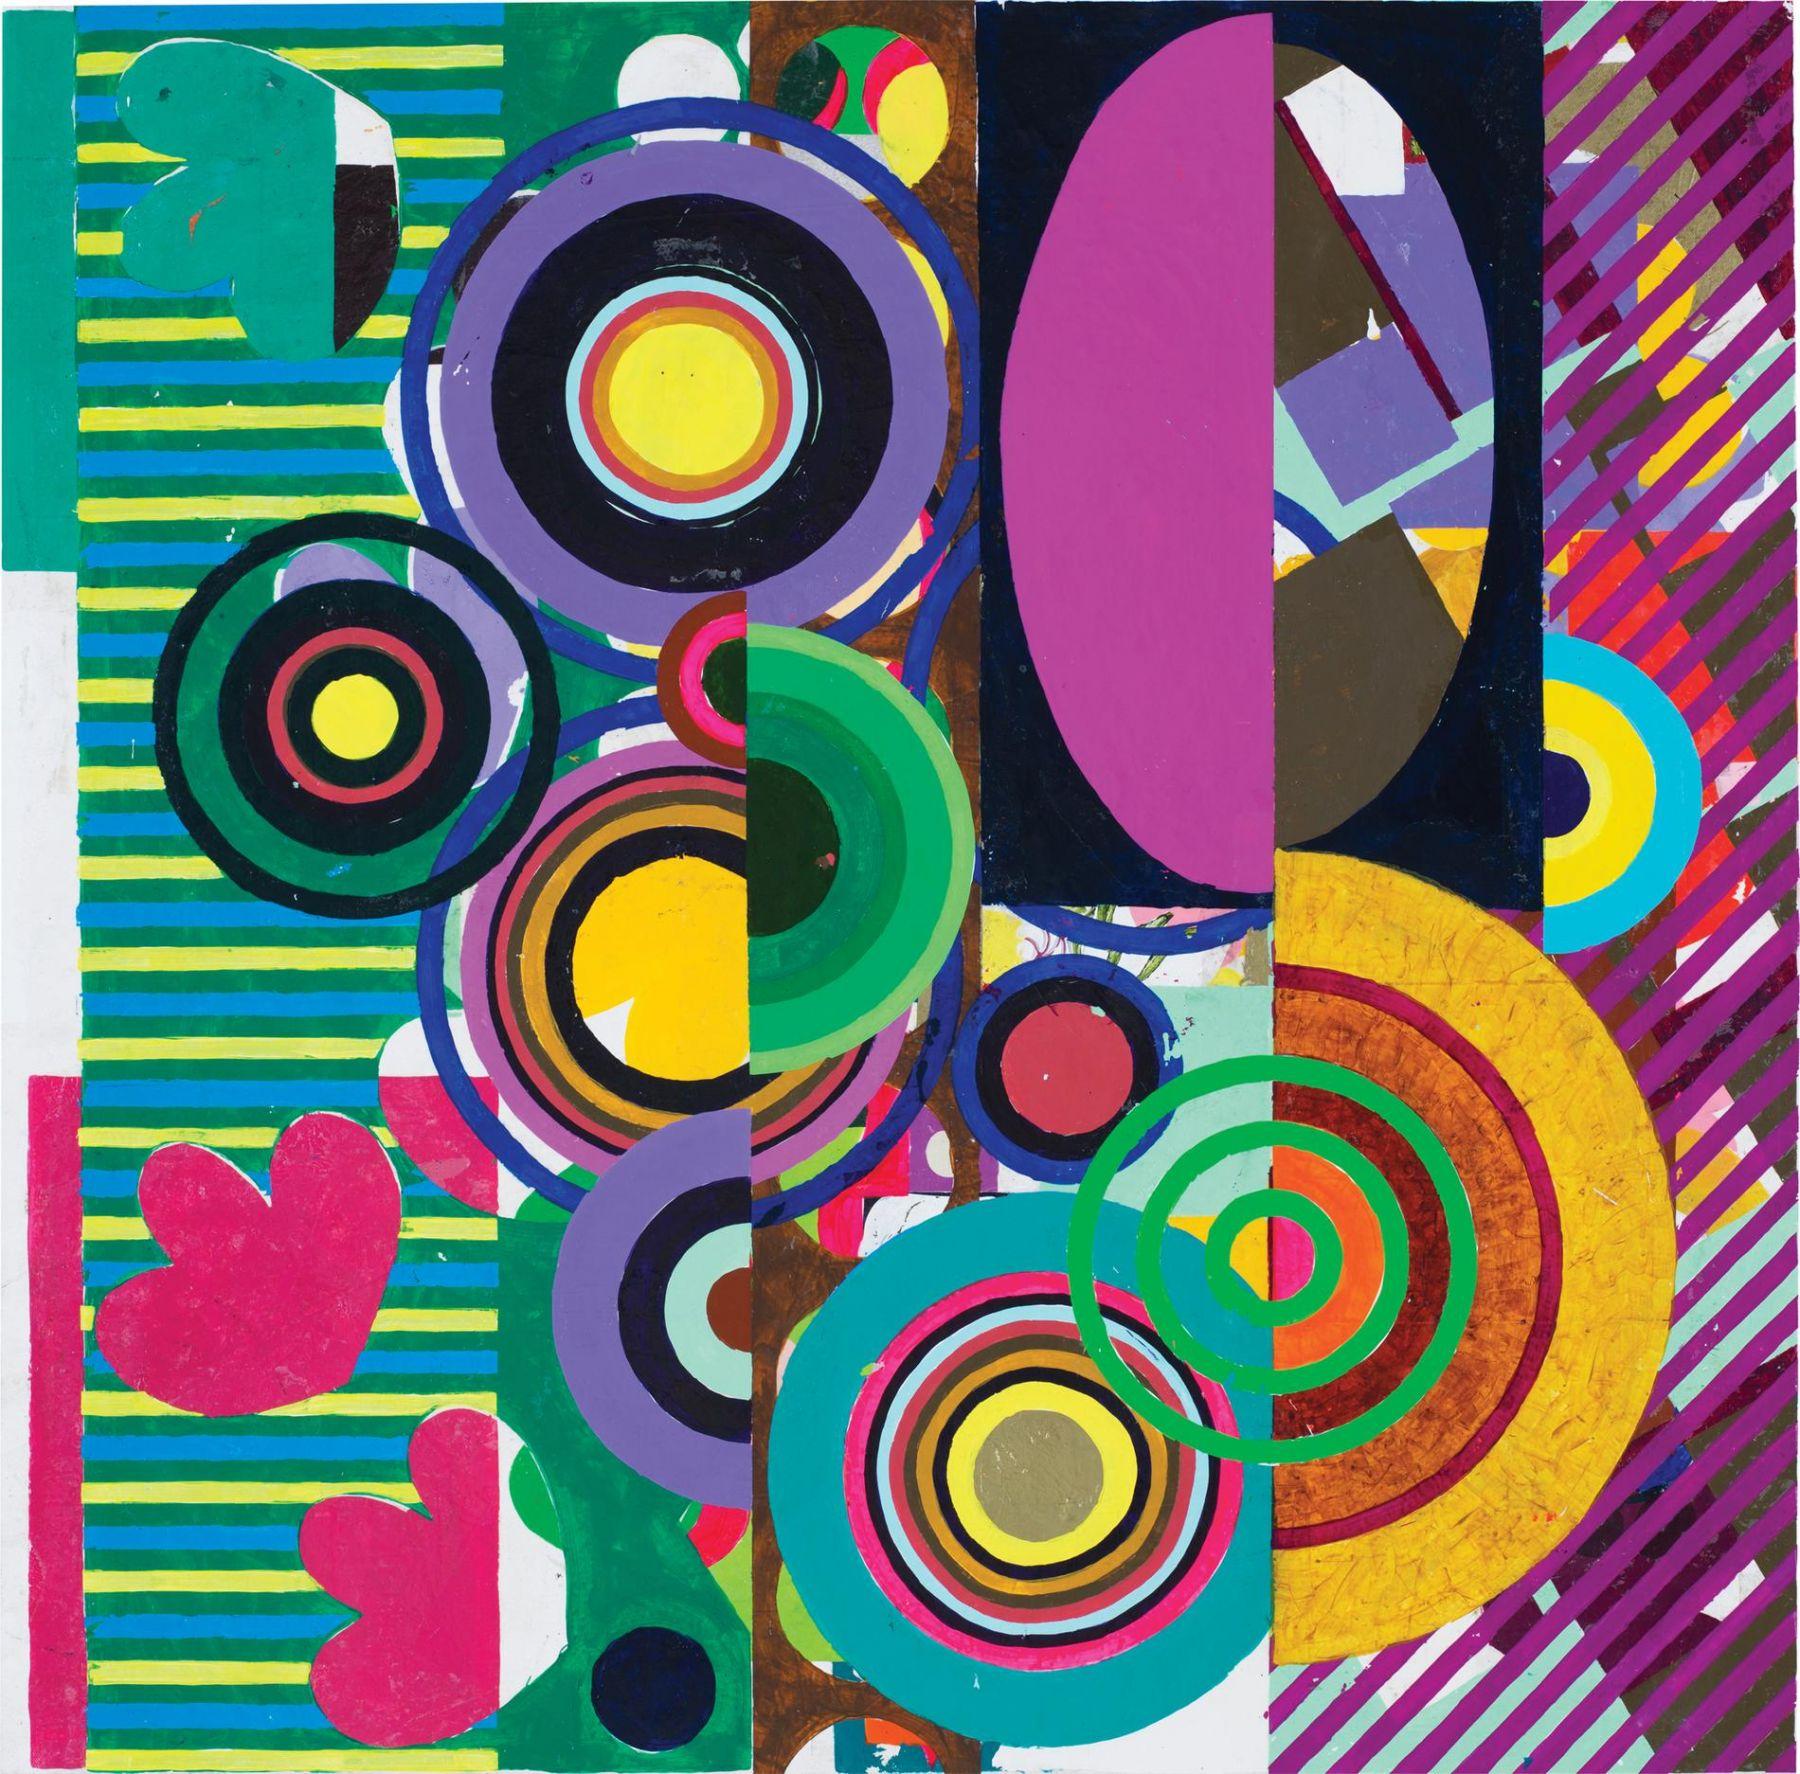 , BEATRIZ MILHAZES (佩阿特丽兹 米拉塞斯),Marotoloco, acrylic on canvas, 31 1/16 x 31 1/4 in.